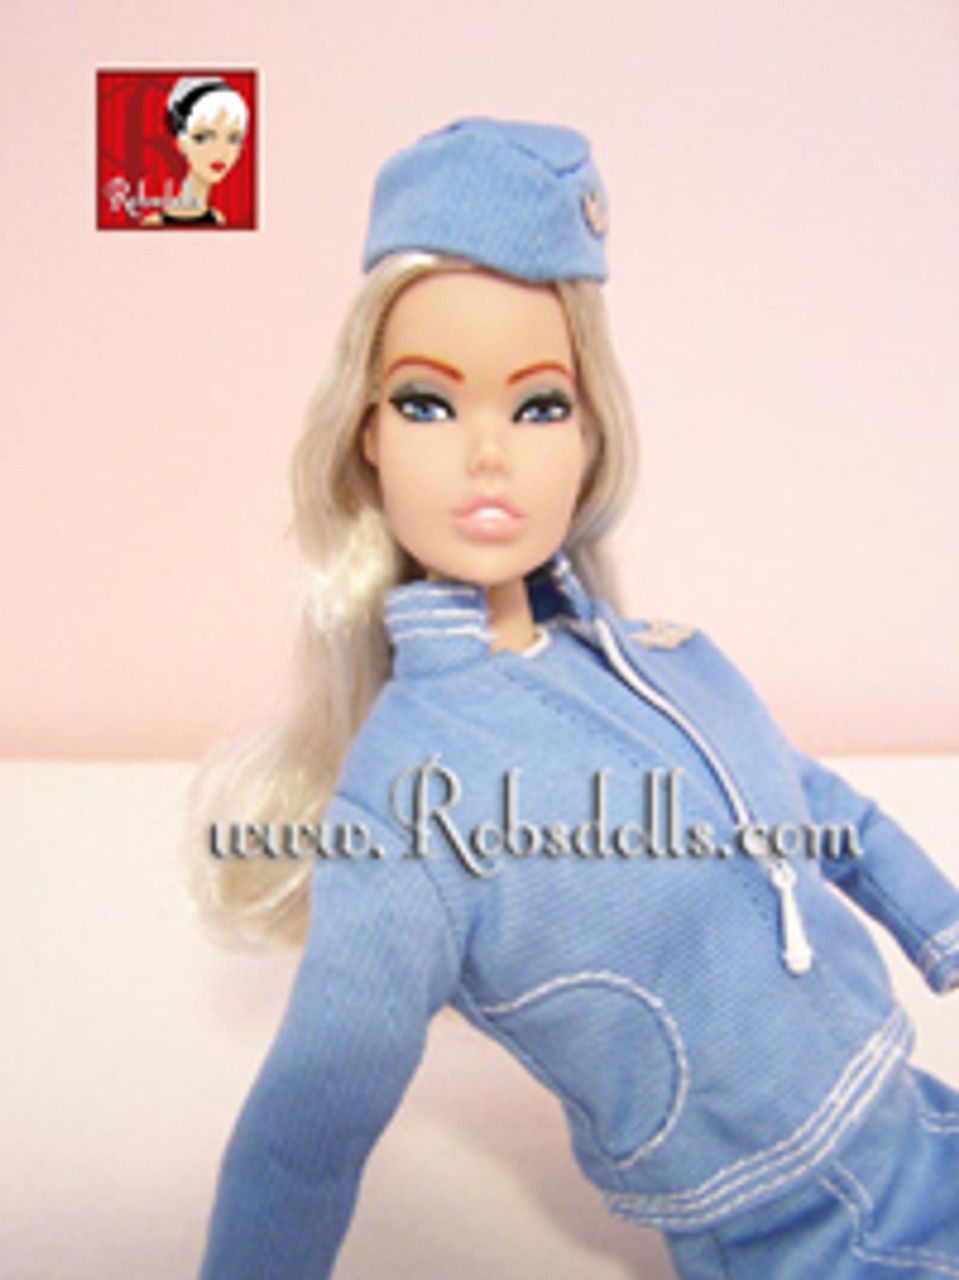 Chaud Blond 78 KatSilk ® Saran Doll Hair